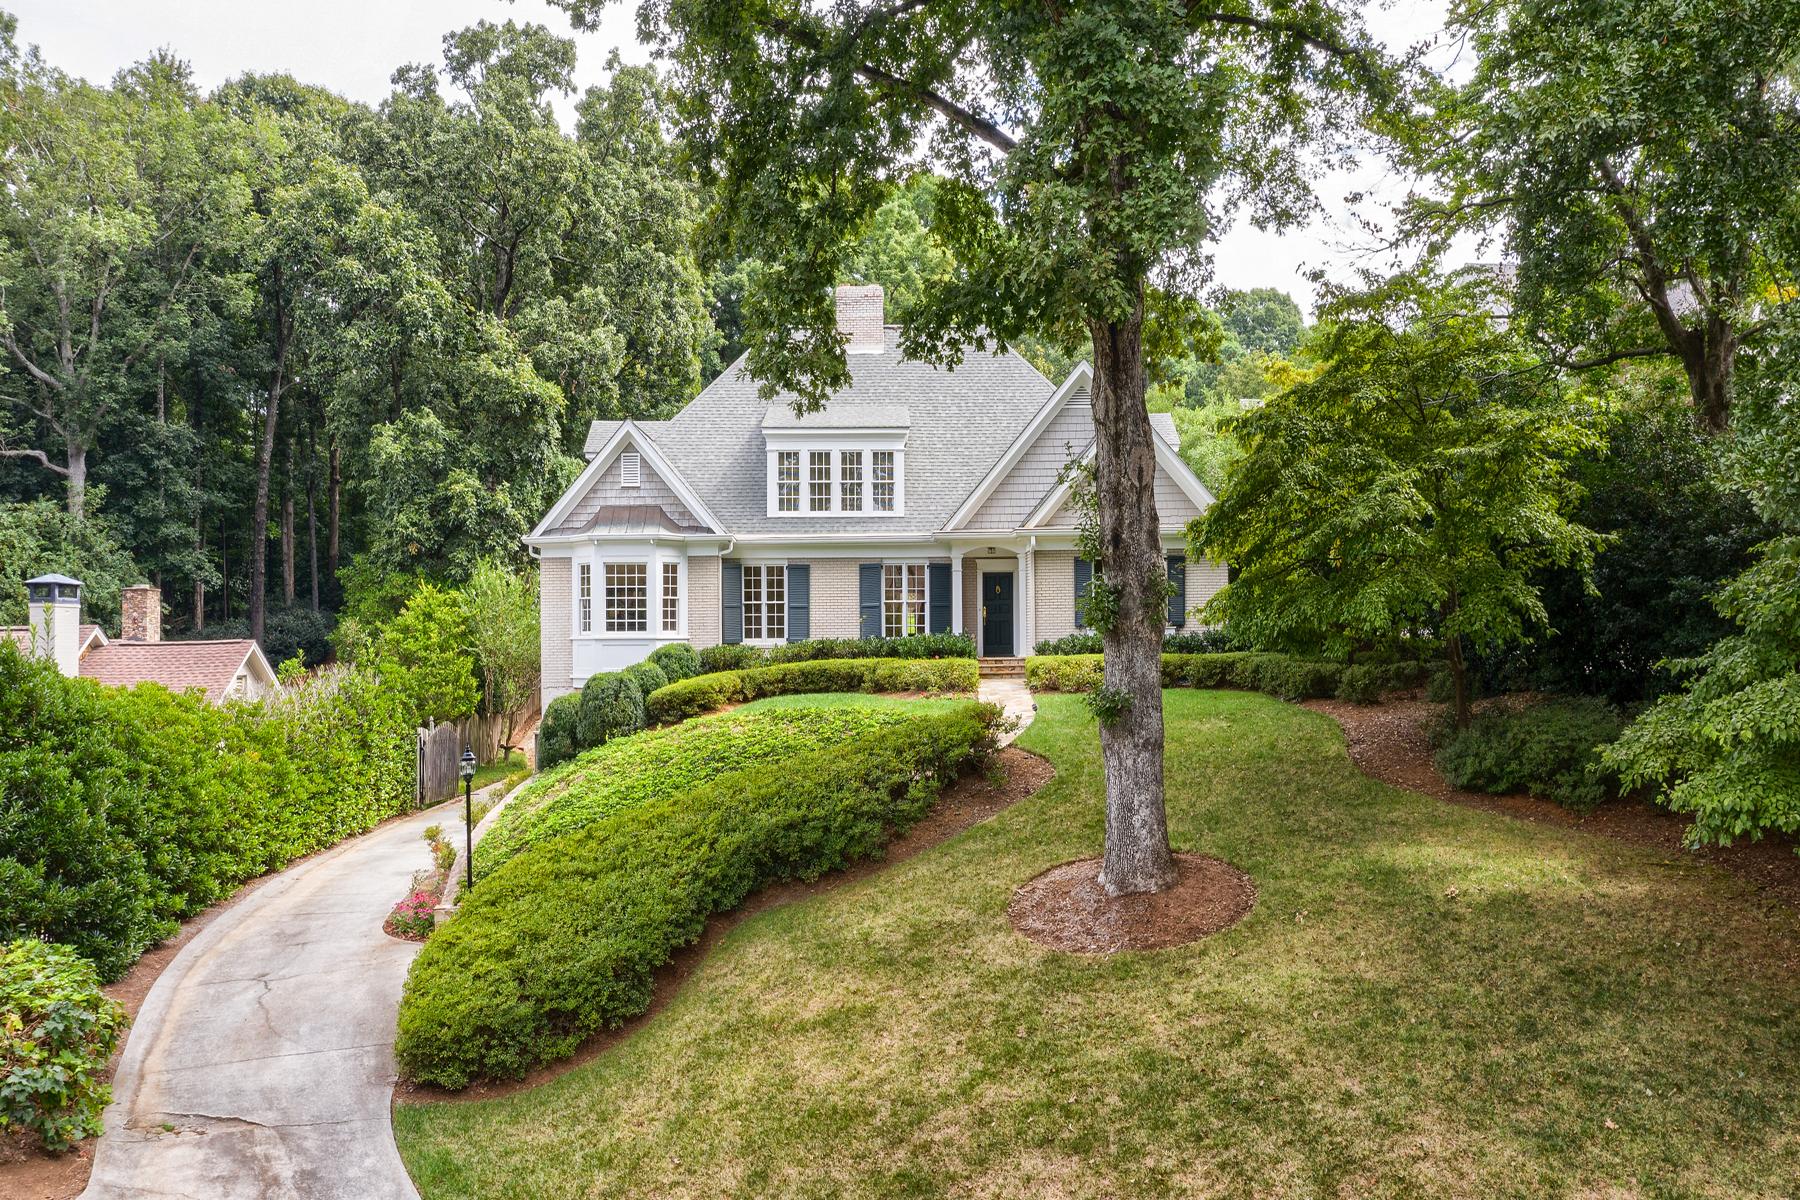 Additional photo for property listing at Prime Buckhead Traditional 71 Blackland Road NW Atlanta, Georgia 30342 United States